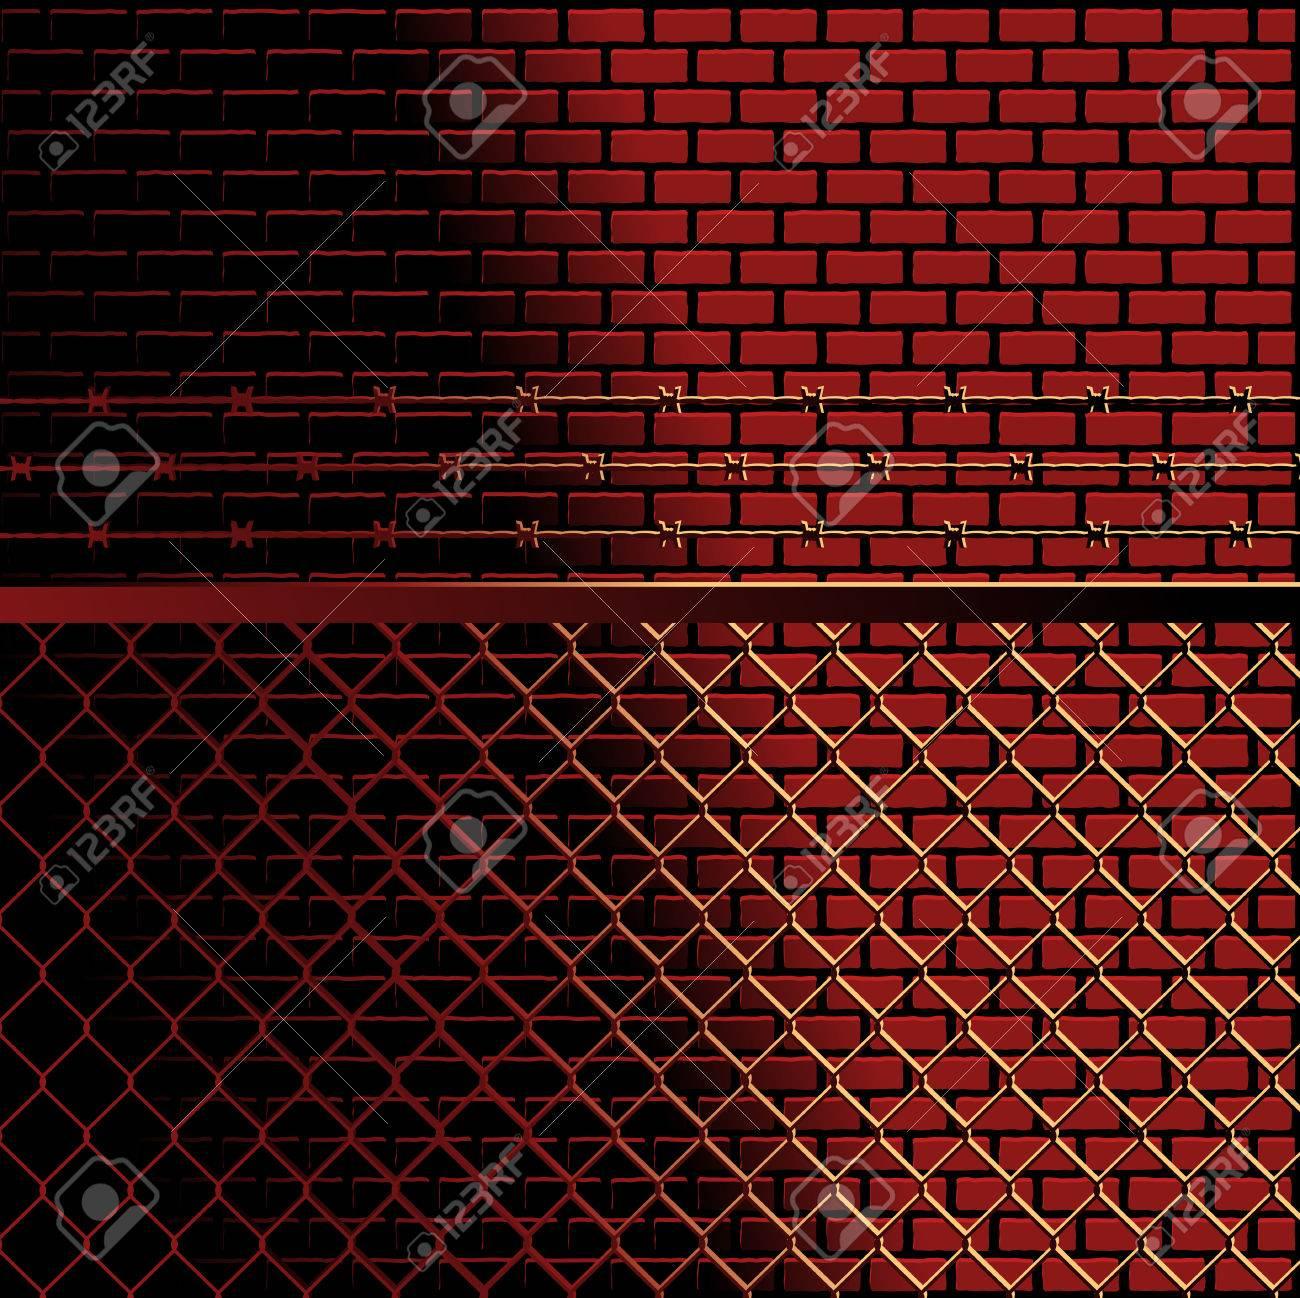 Bricks and fence background - 6981910